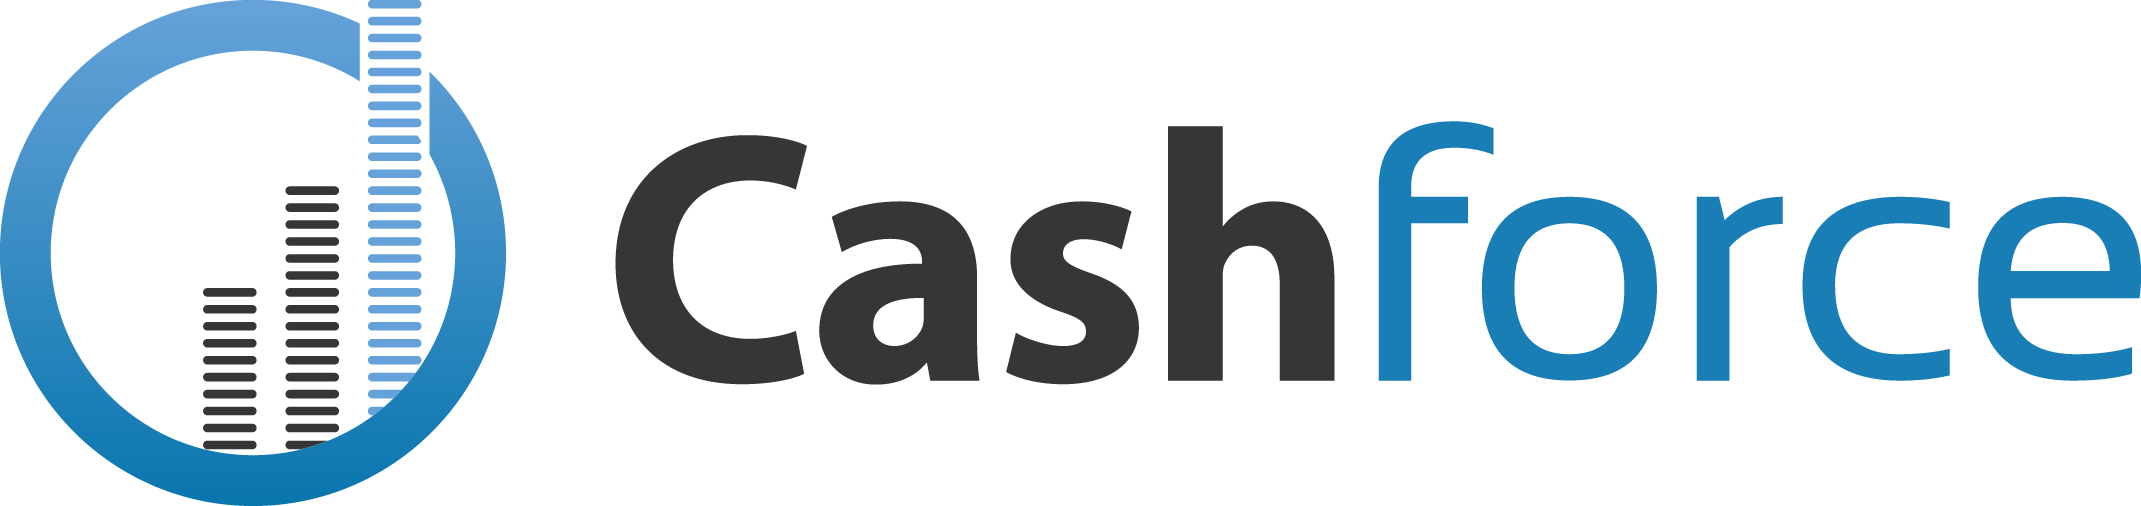 Cashforce icon